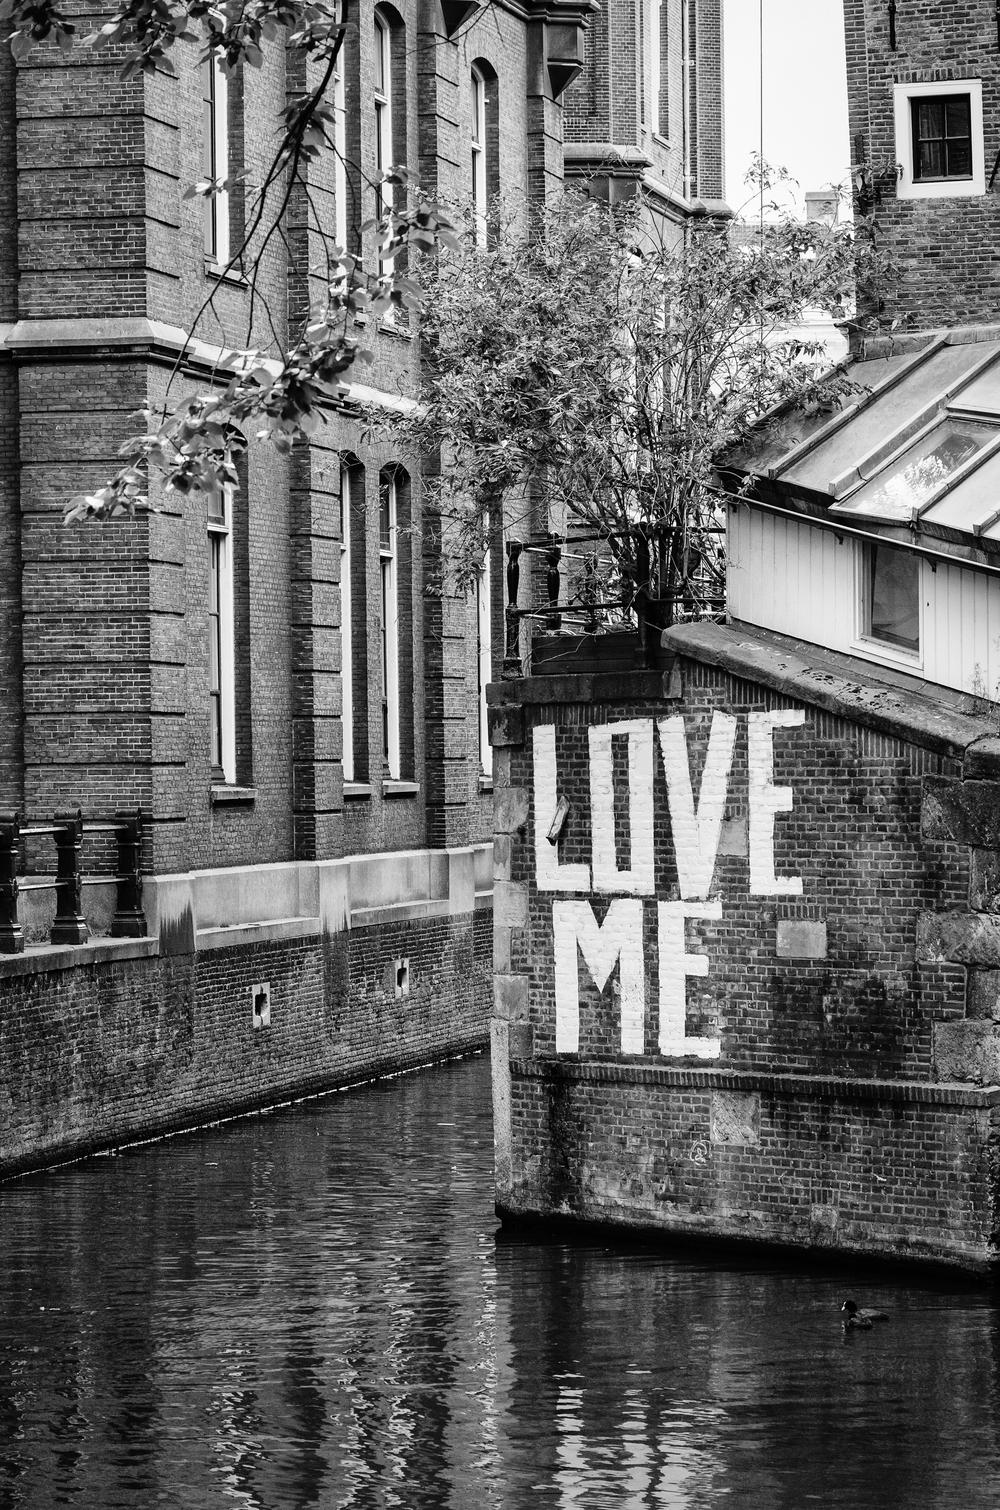 Plead - Amsterdam, Netherlands.